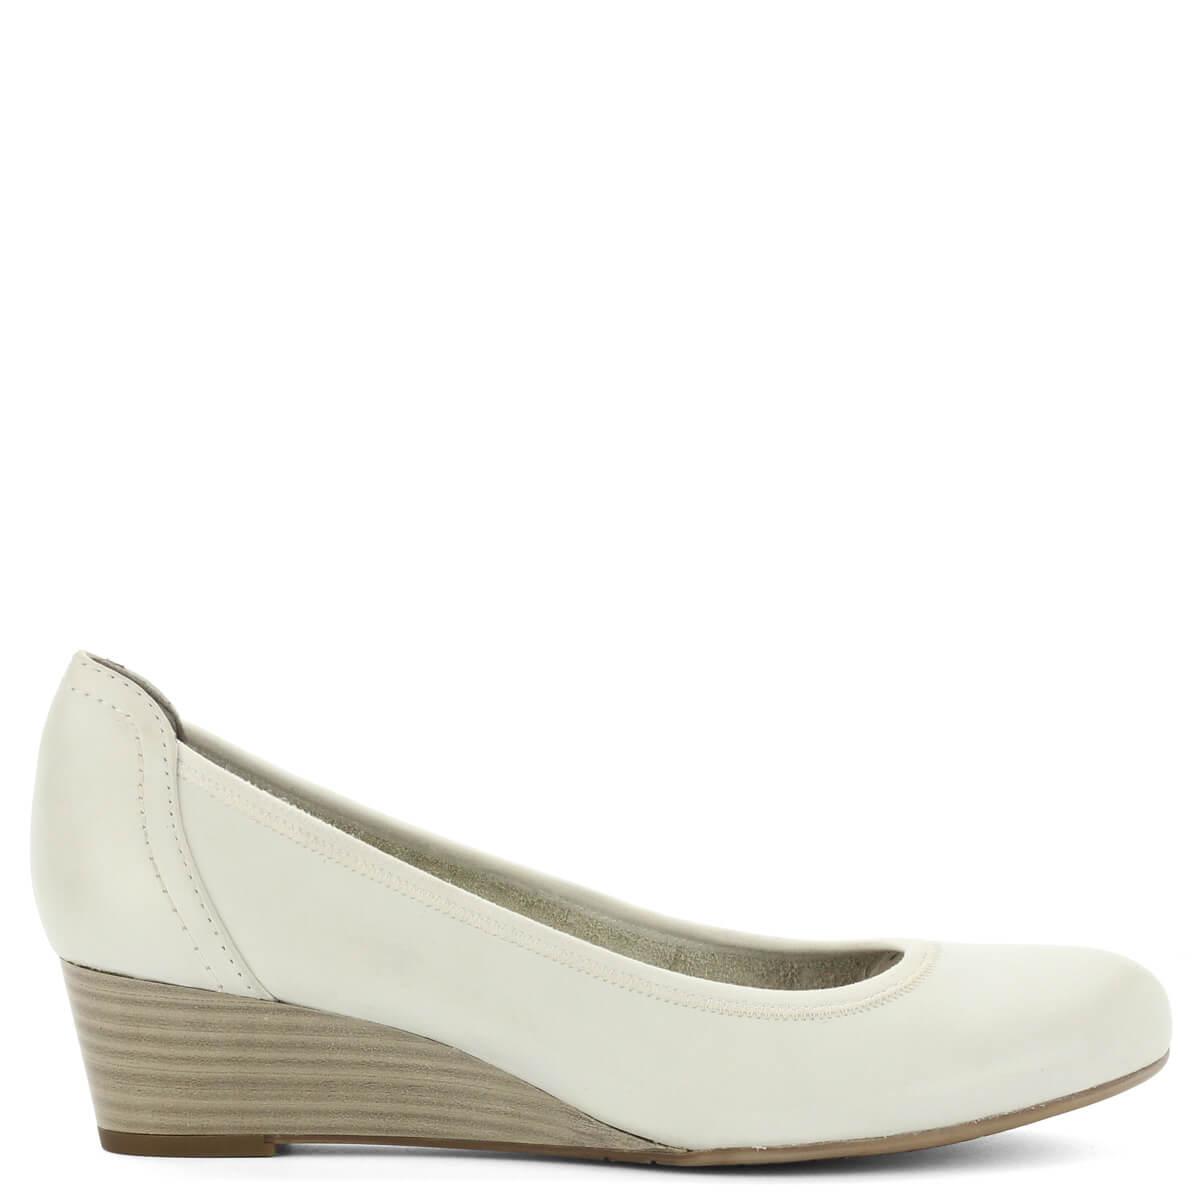 Telitalpú fehér Tamaris cipő 4 cm magas sarokkal b016072547